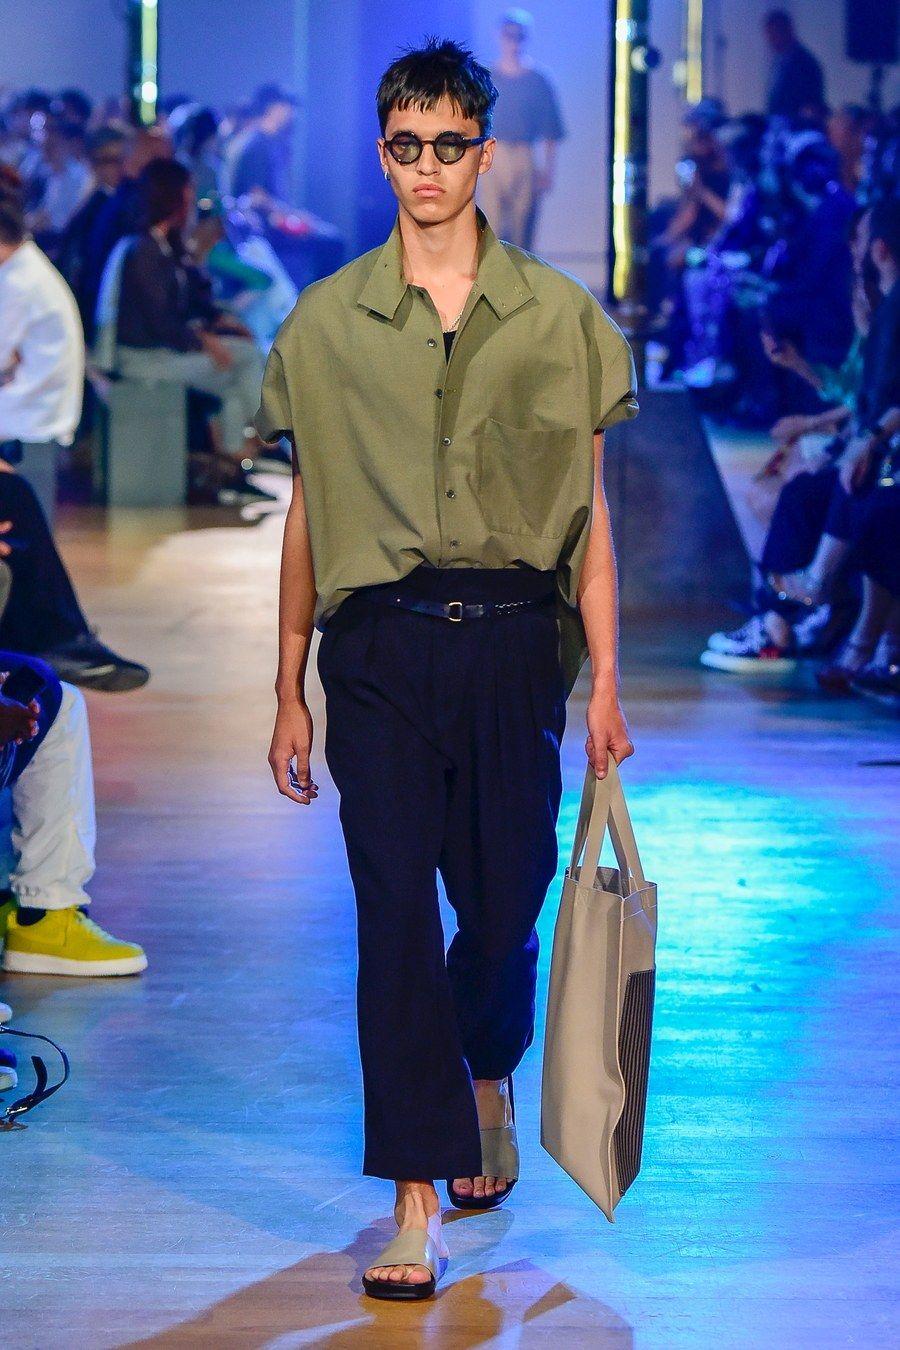 Cerruti 1881 Spring 2019 Menswear Fashion Show – yfkr